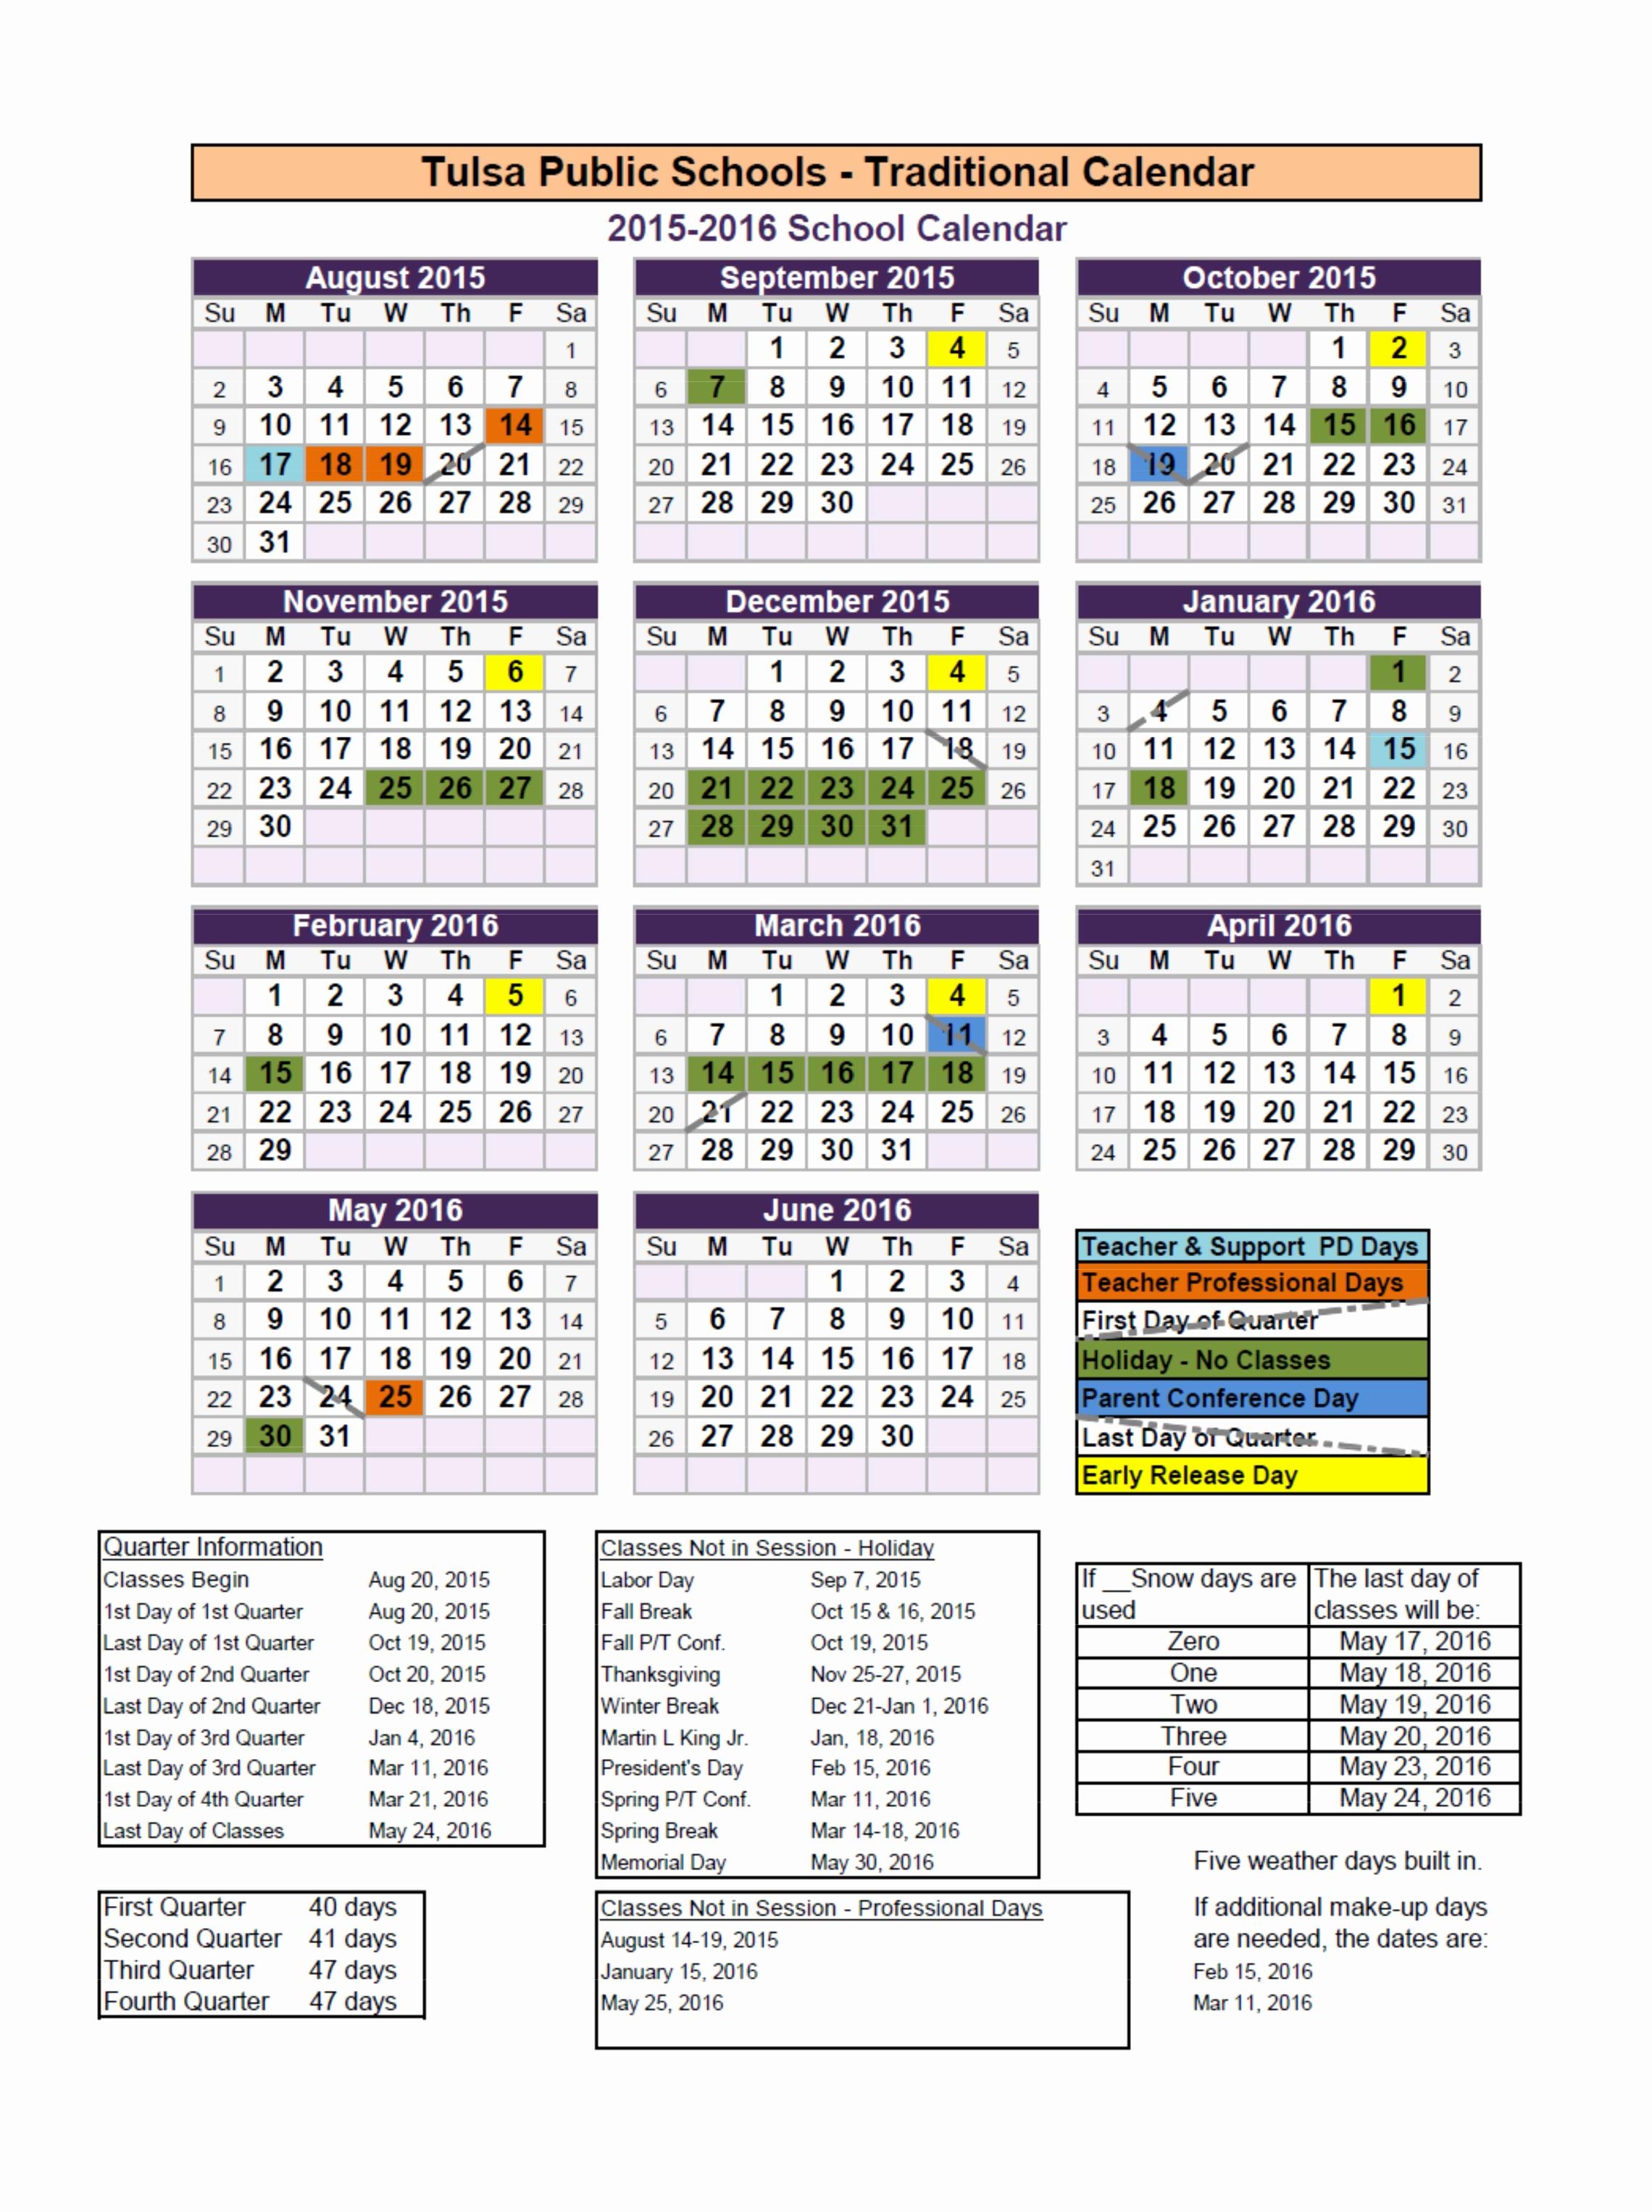 Broward School Calendar 2019 Luxury School Year Calendar For 2018 17 School Calendar 2019 20 Broward